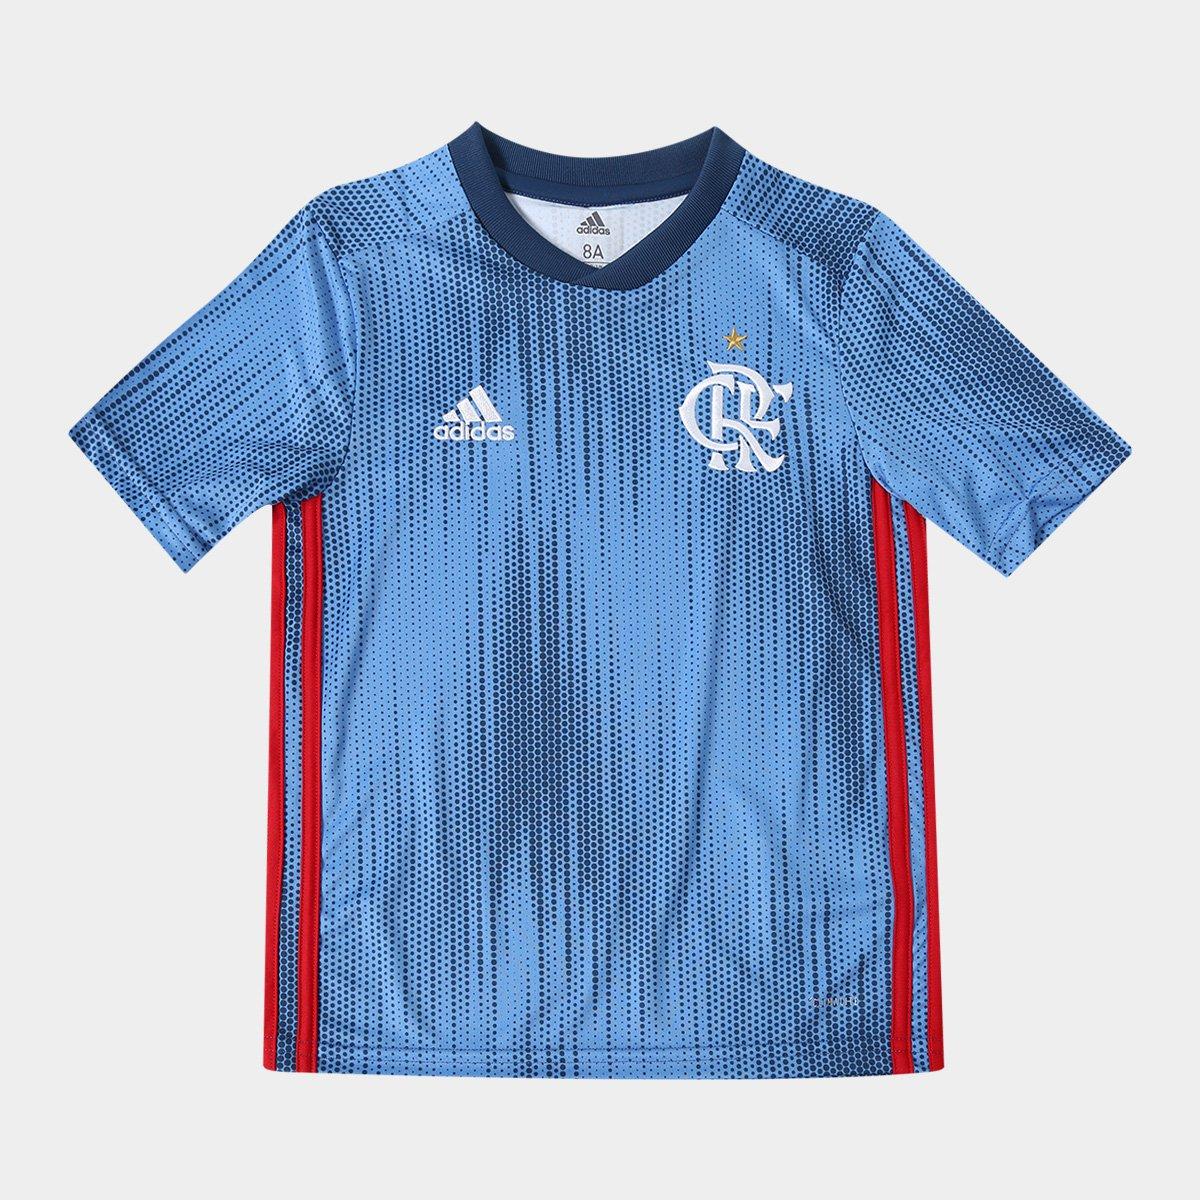 Azul s n° Infantil Camisa III Flamengo 2018 Torcedor Adidas SfwZWTUqOx ... bbda415ce6a35